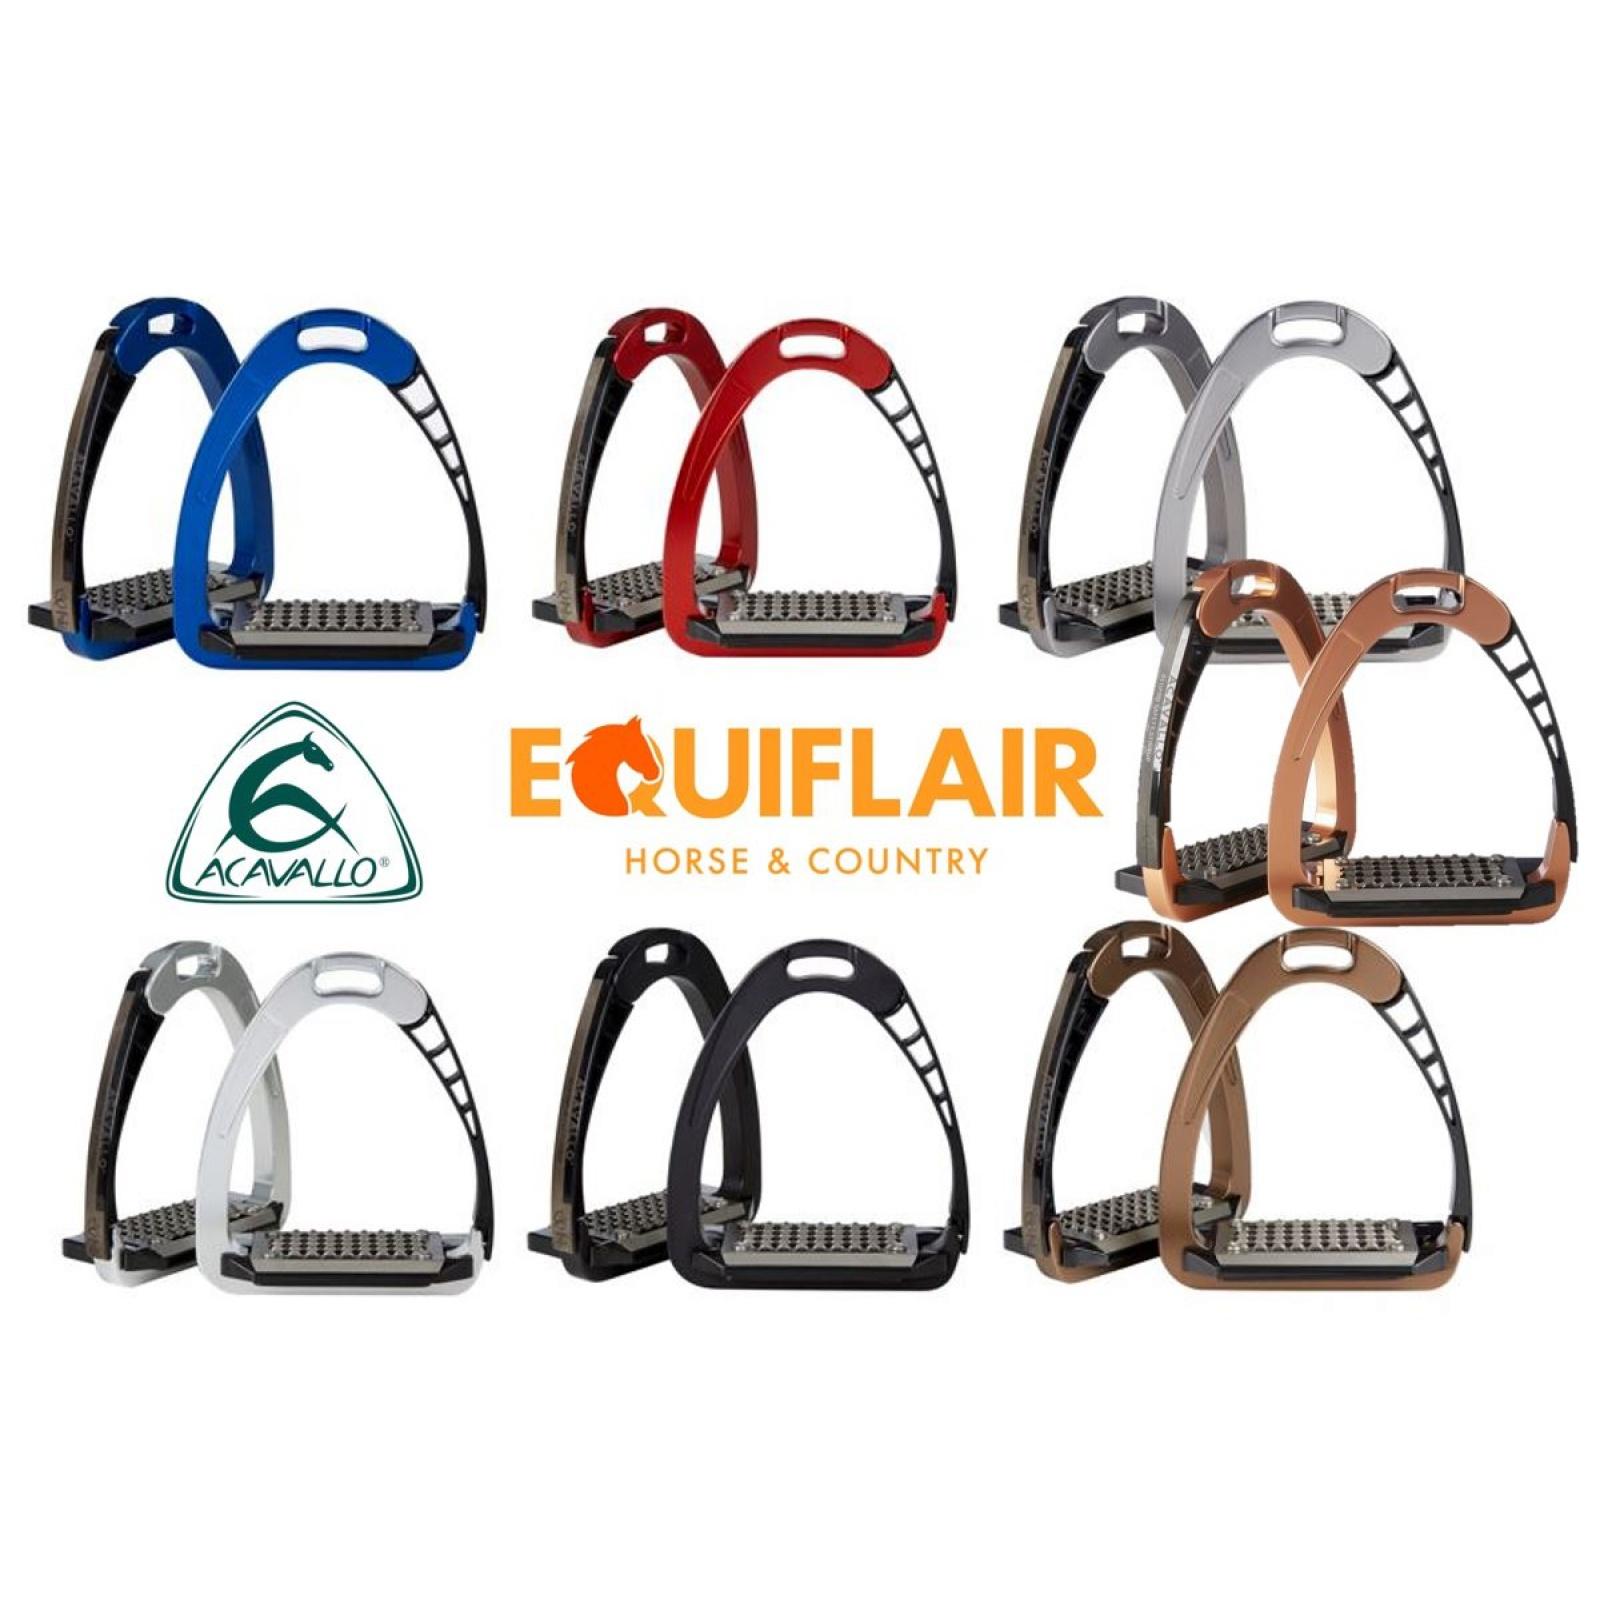 Acavallo-Arena-AluPro-Aluminium-Safety-Stirrup-Irons miniature 3